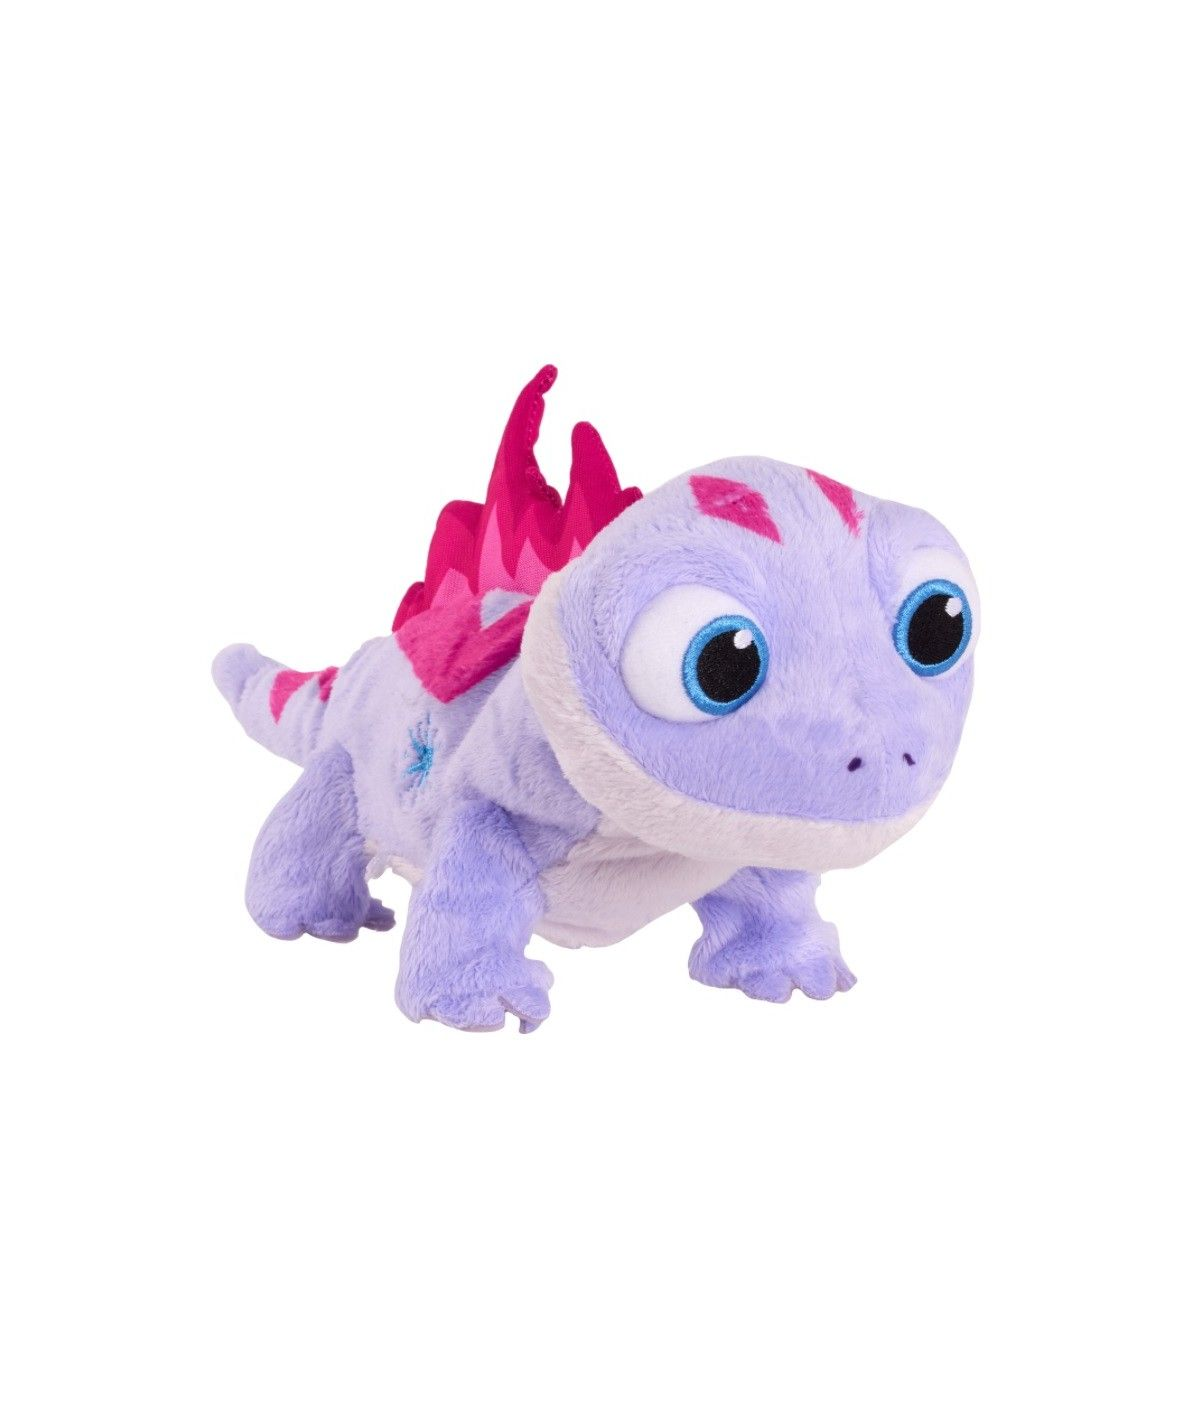 Peluche Salamandra movibile Frozen II Disney Store